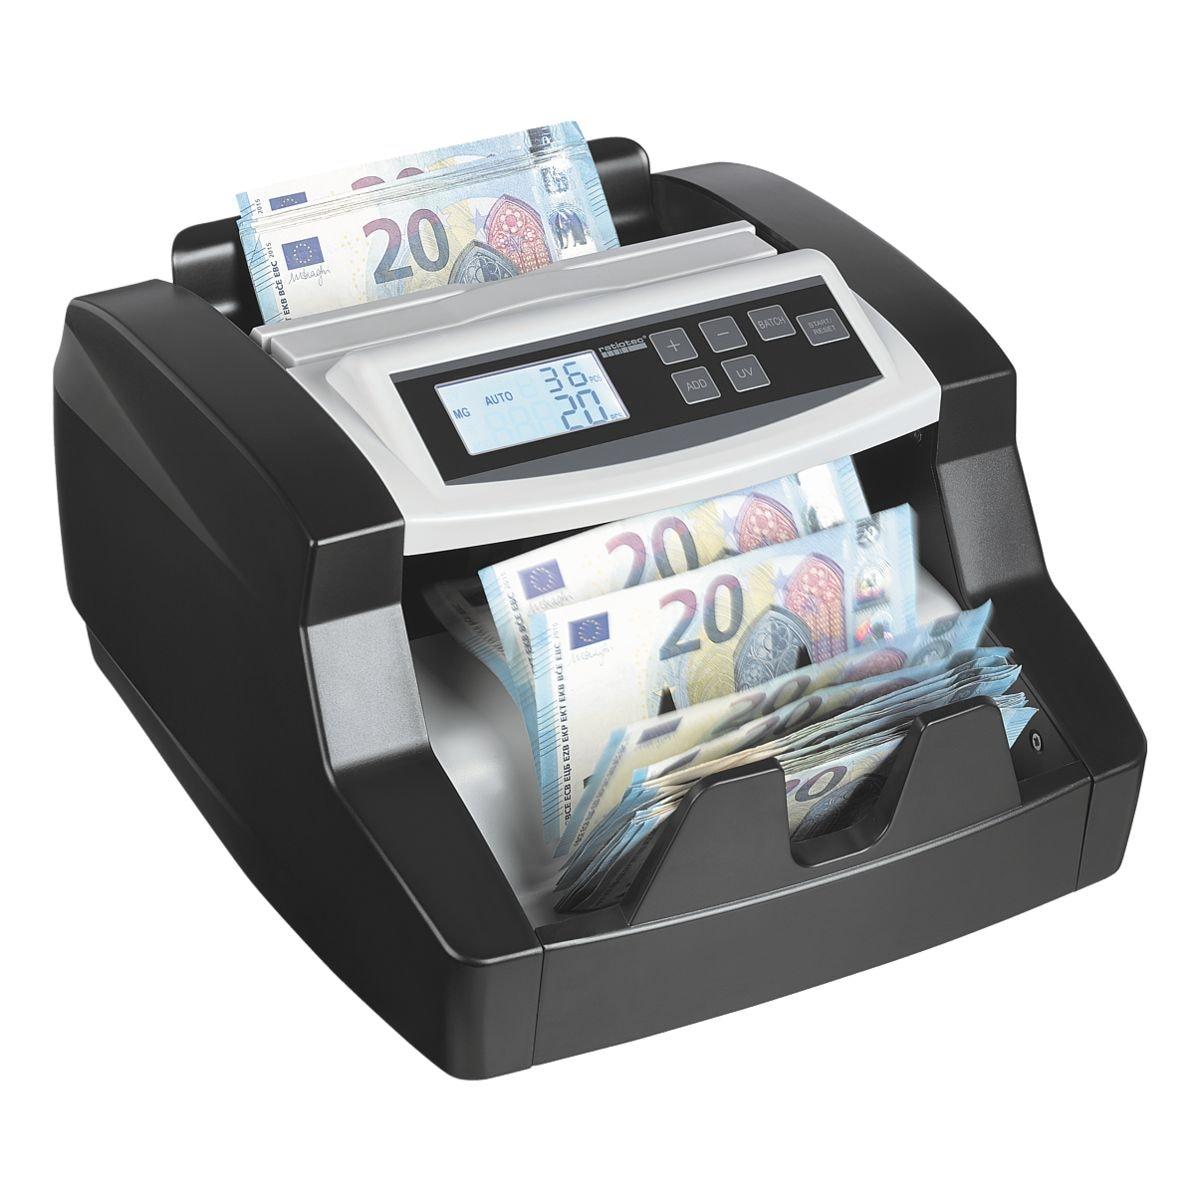 ratiotec Banknotenzählmaschine »rapidcount B 20«